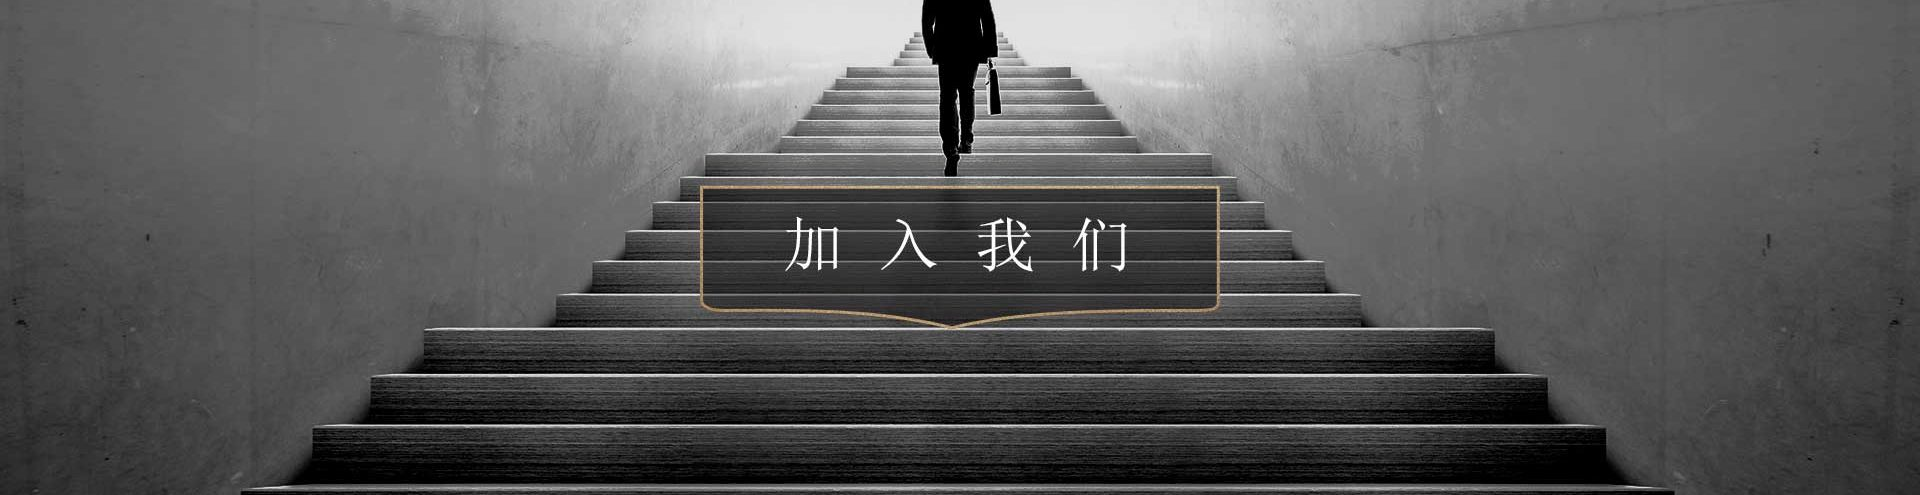 Career-Chinese-Desktop